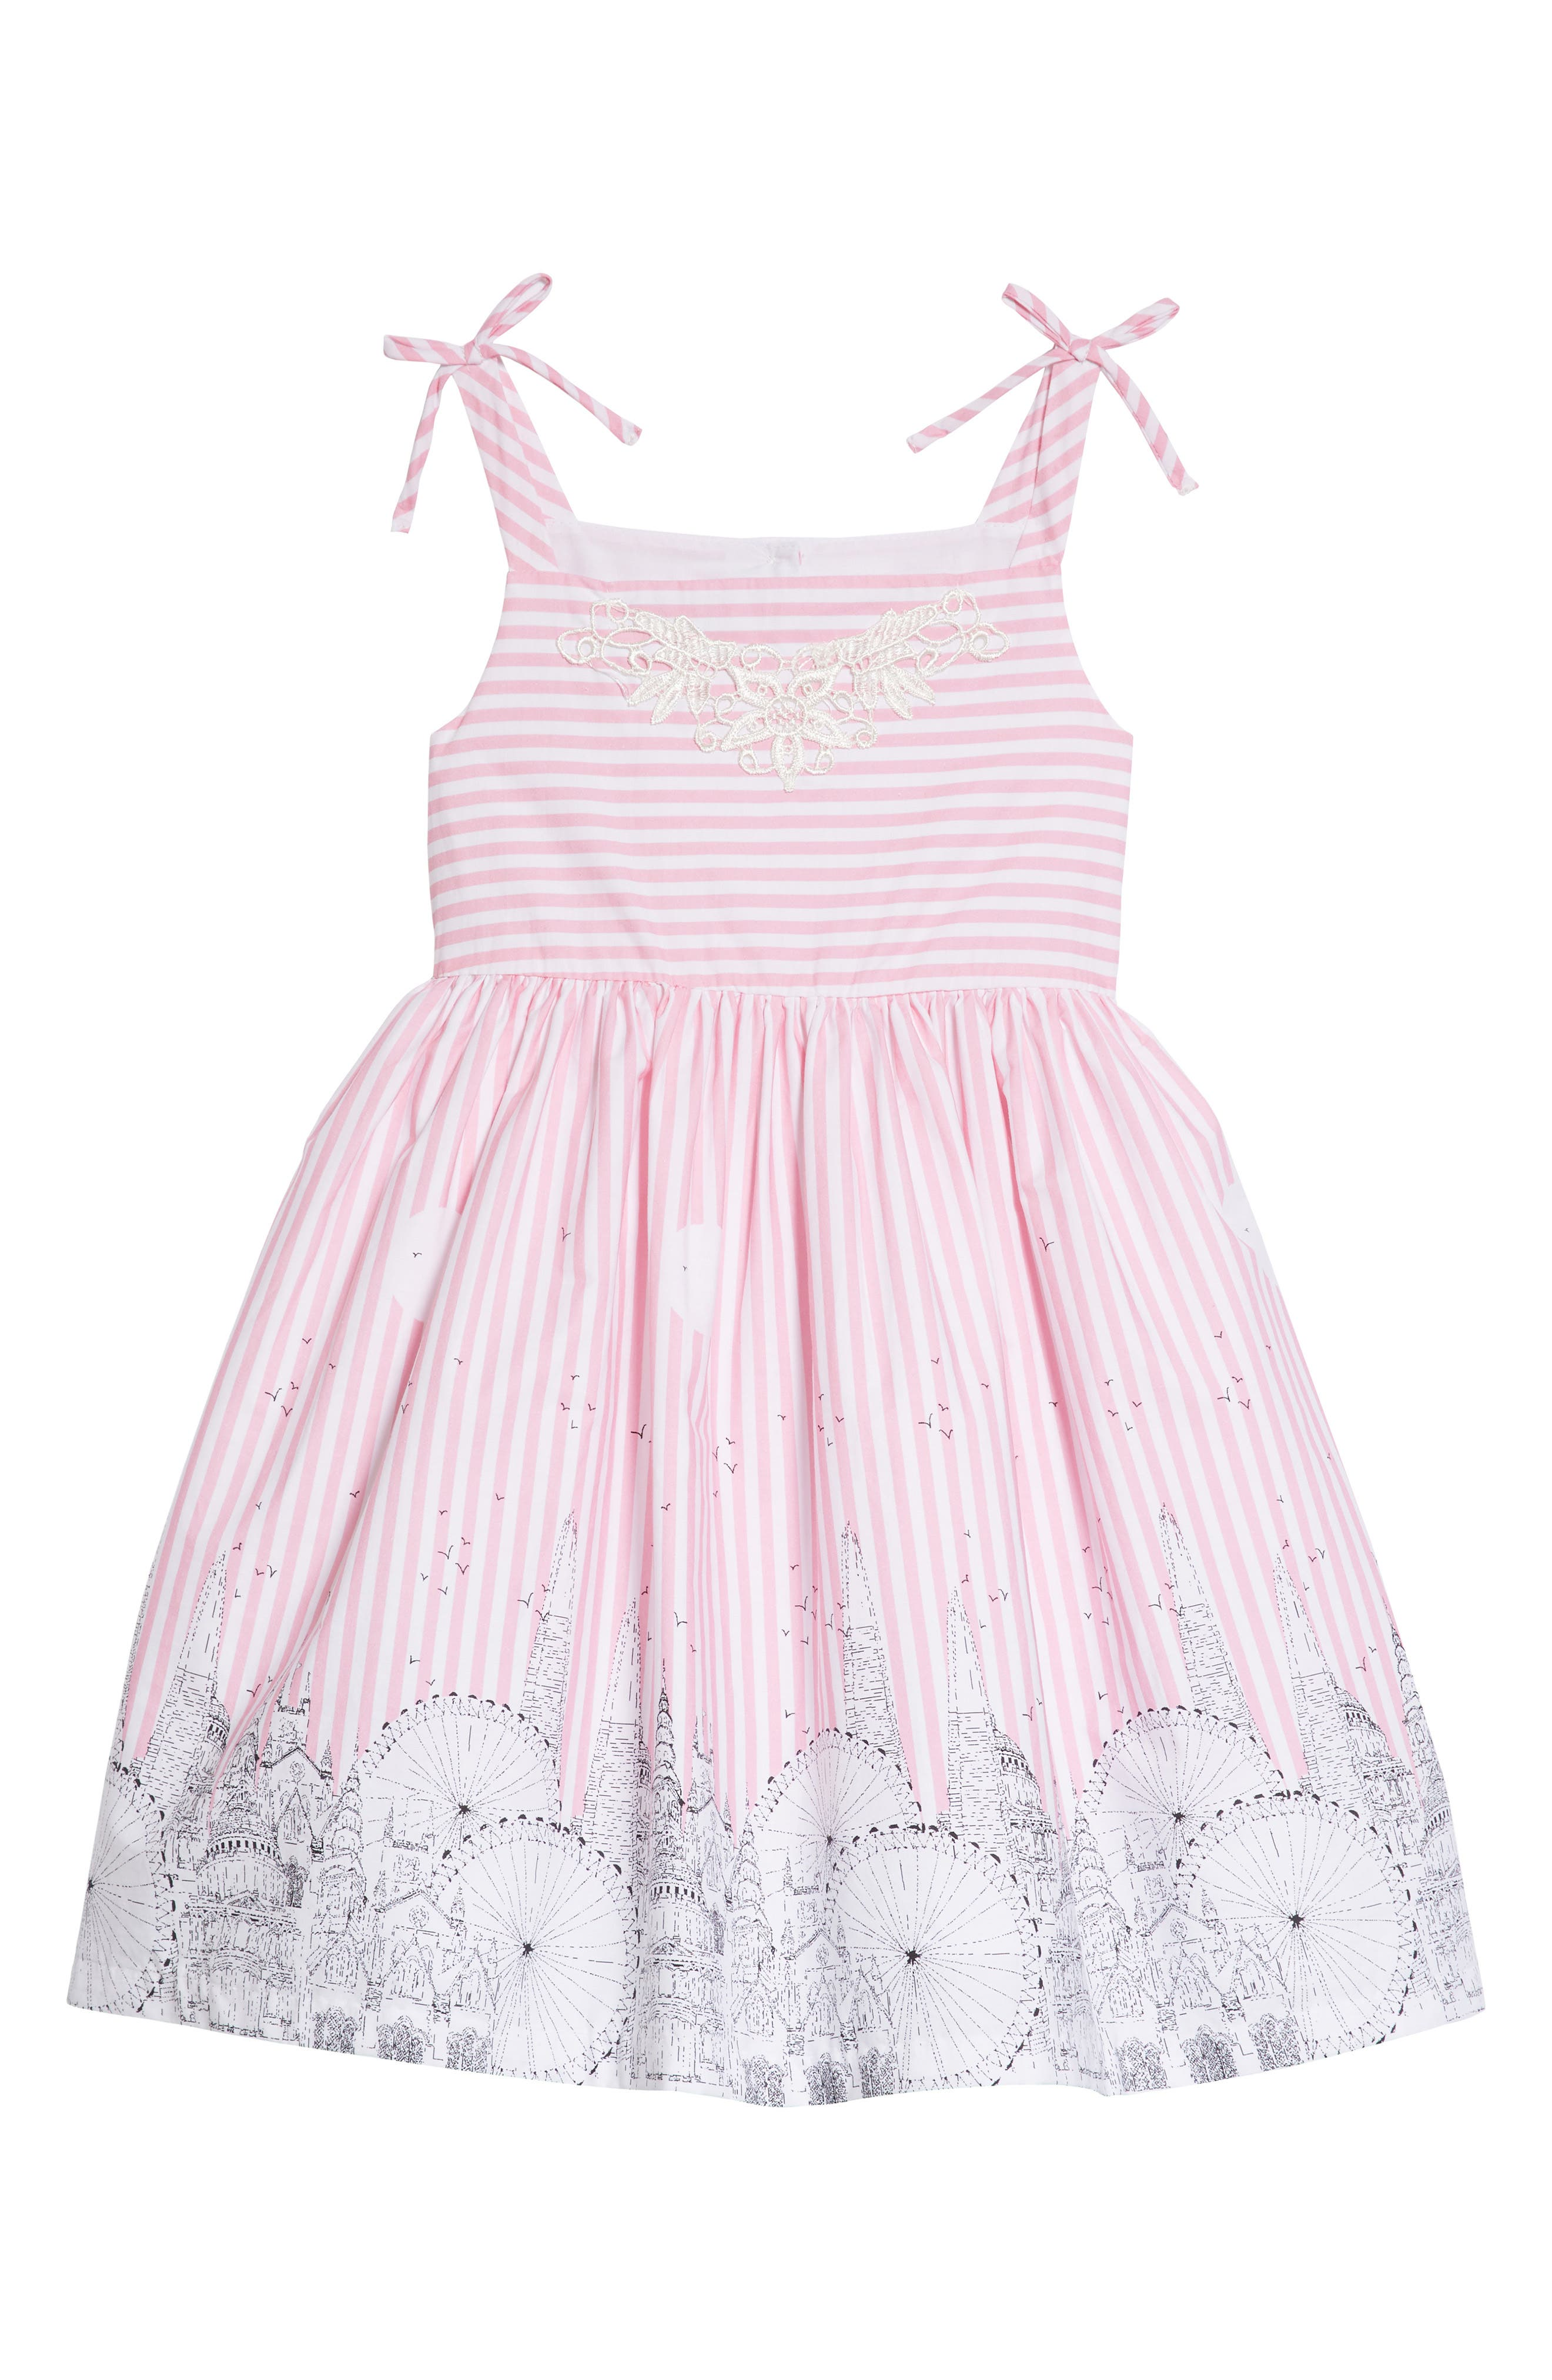 Cityscape Dress,                         Main,                         color, Pink/ White